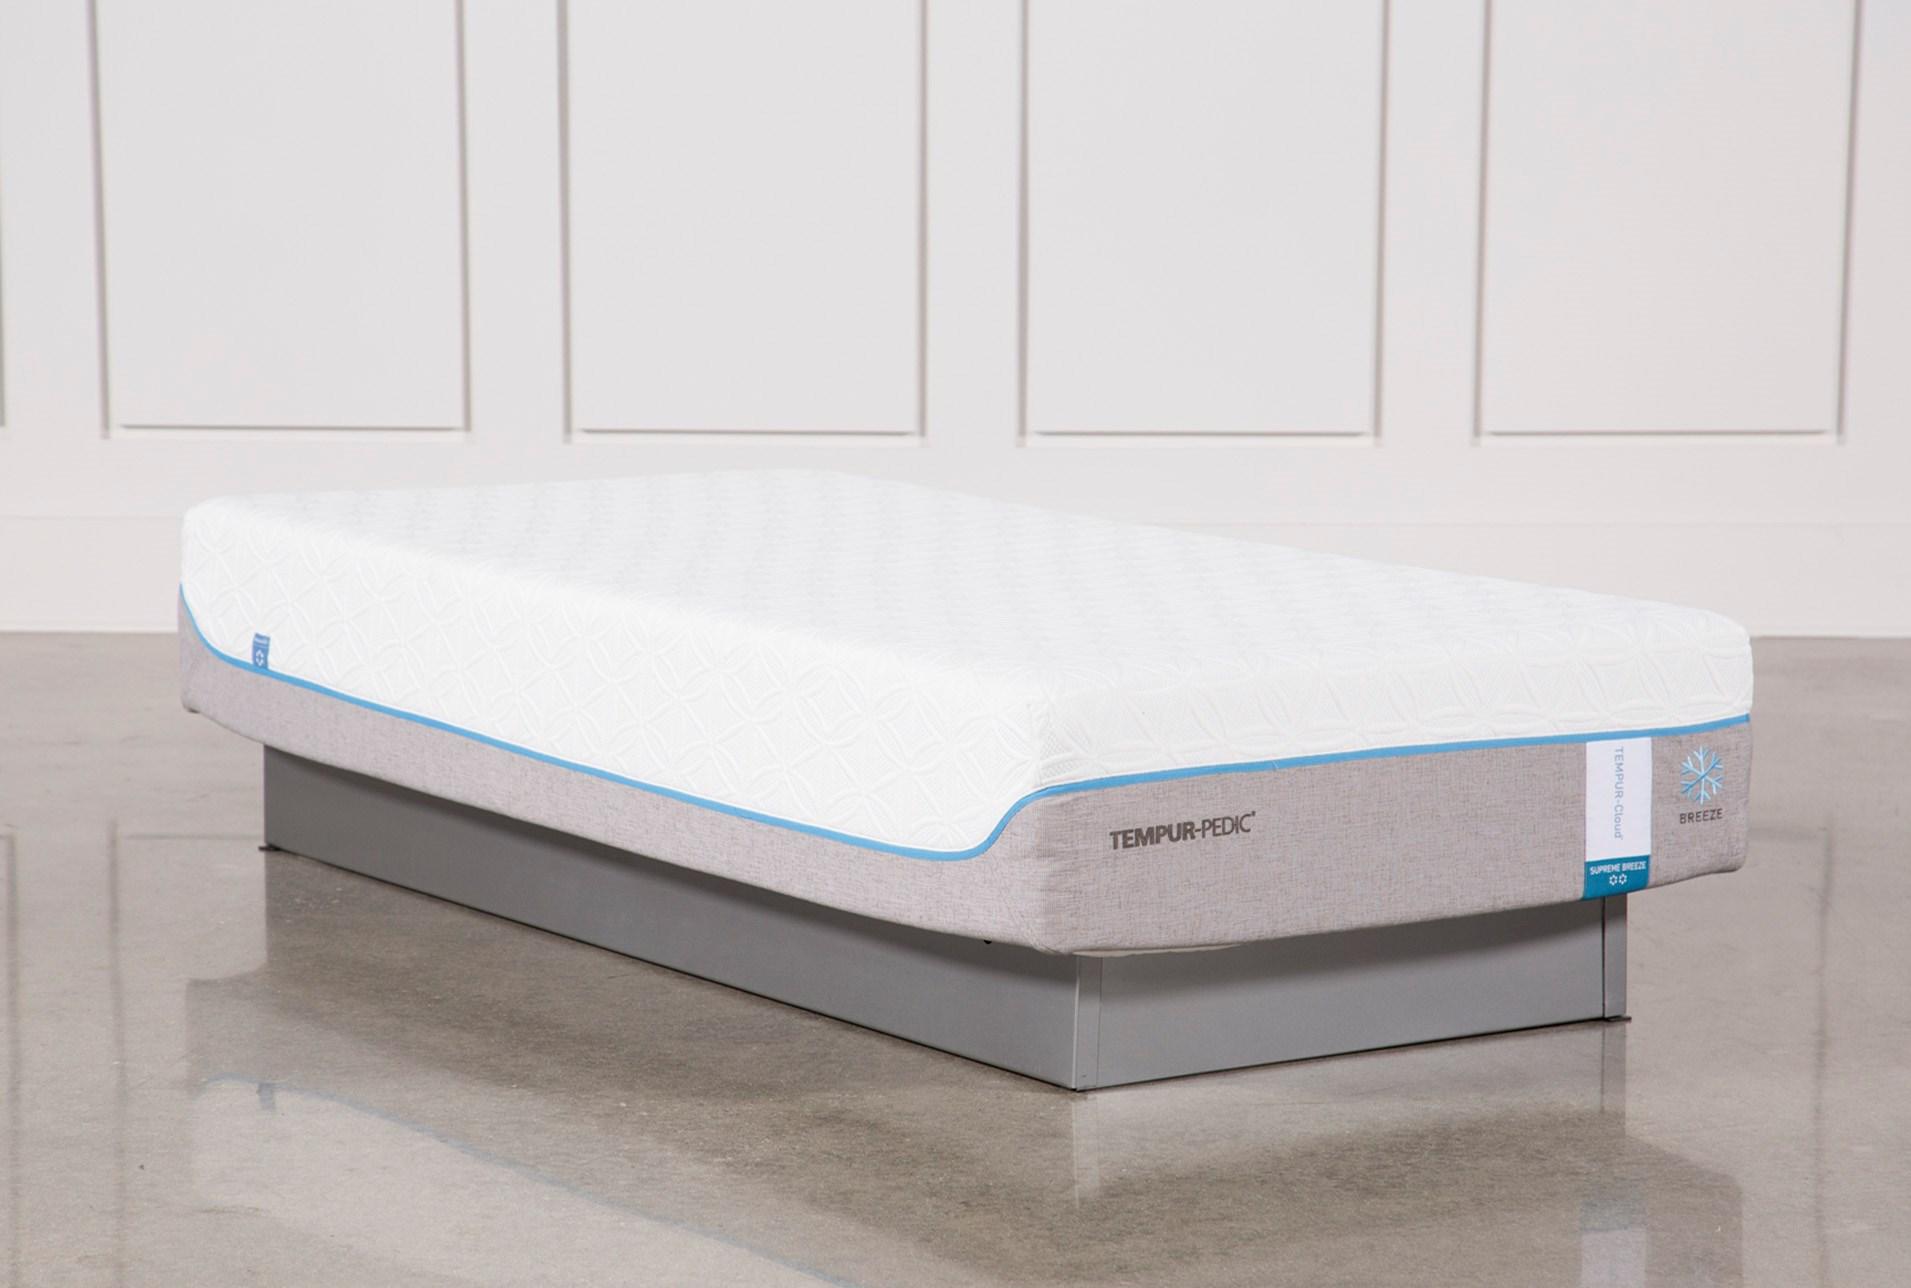 decorative mattress cover. Tempur-Pedic Cloud Supreme Breeze 2.0 Twin Extra Long Mattress Decorative Cover